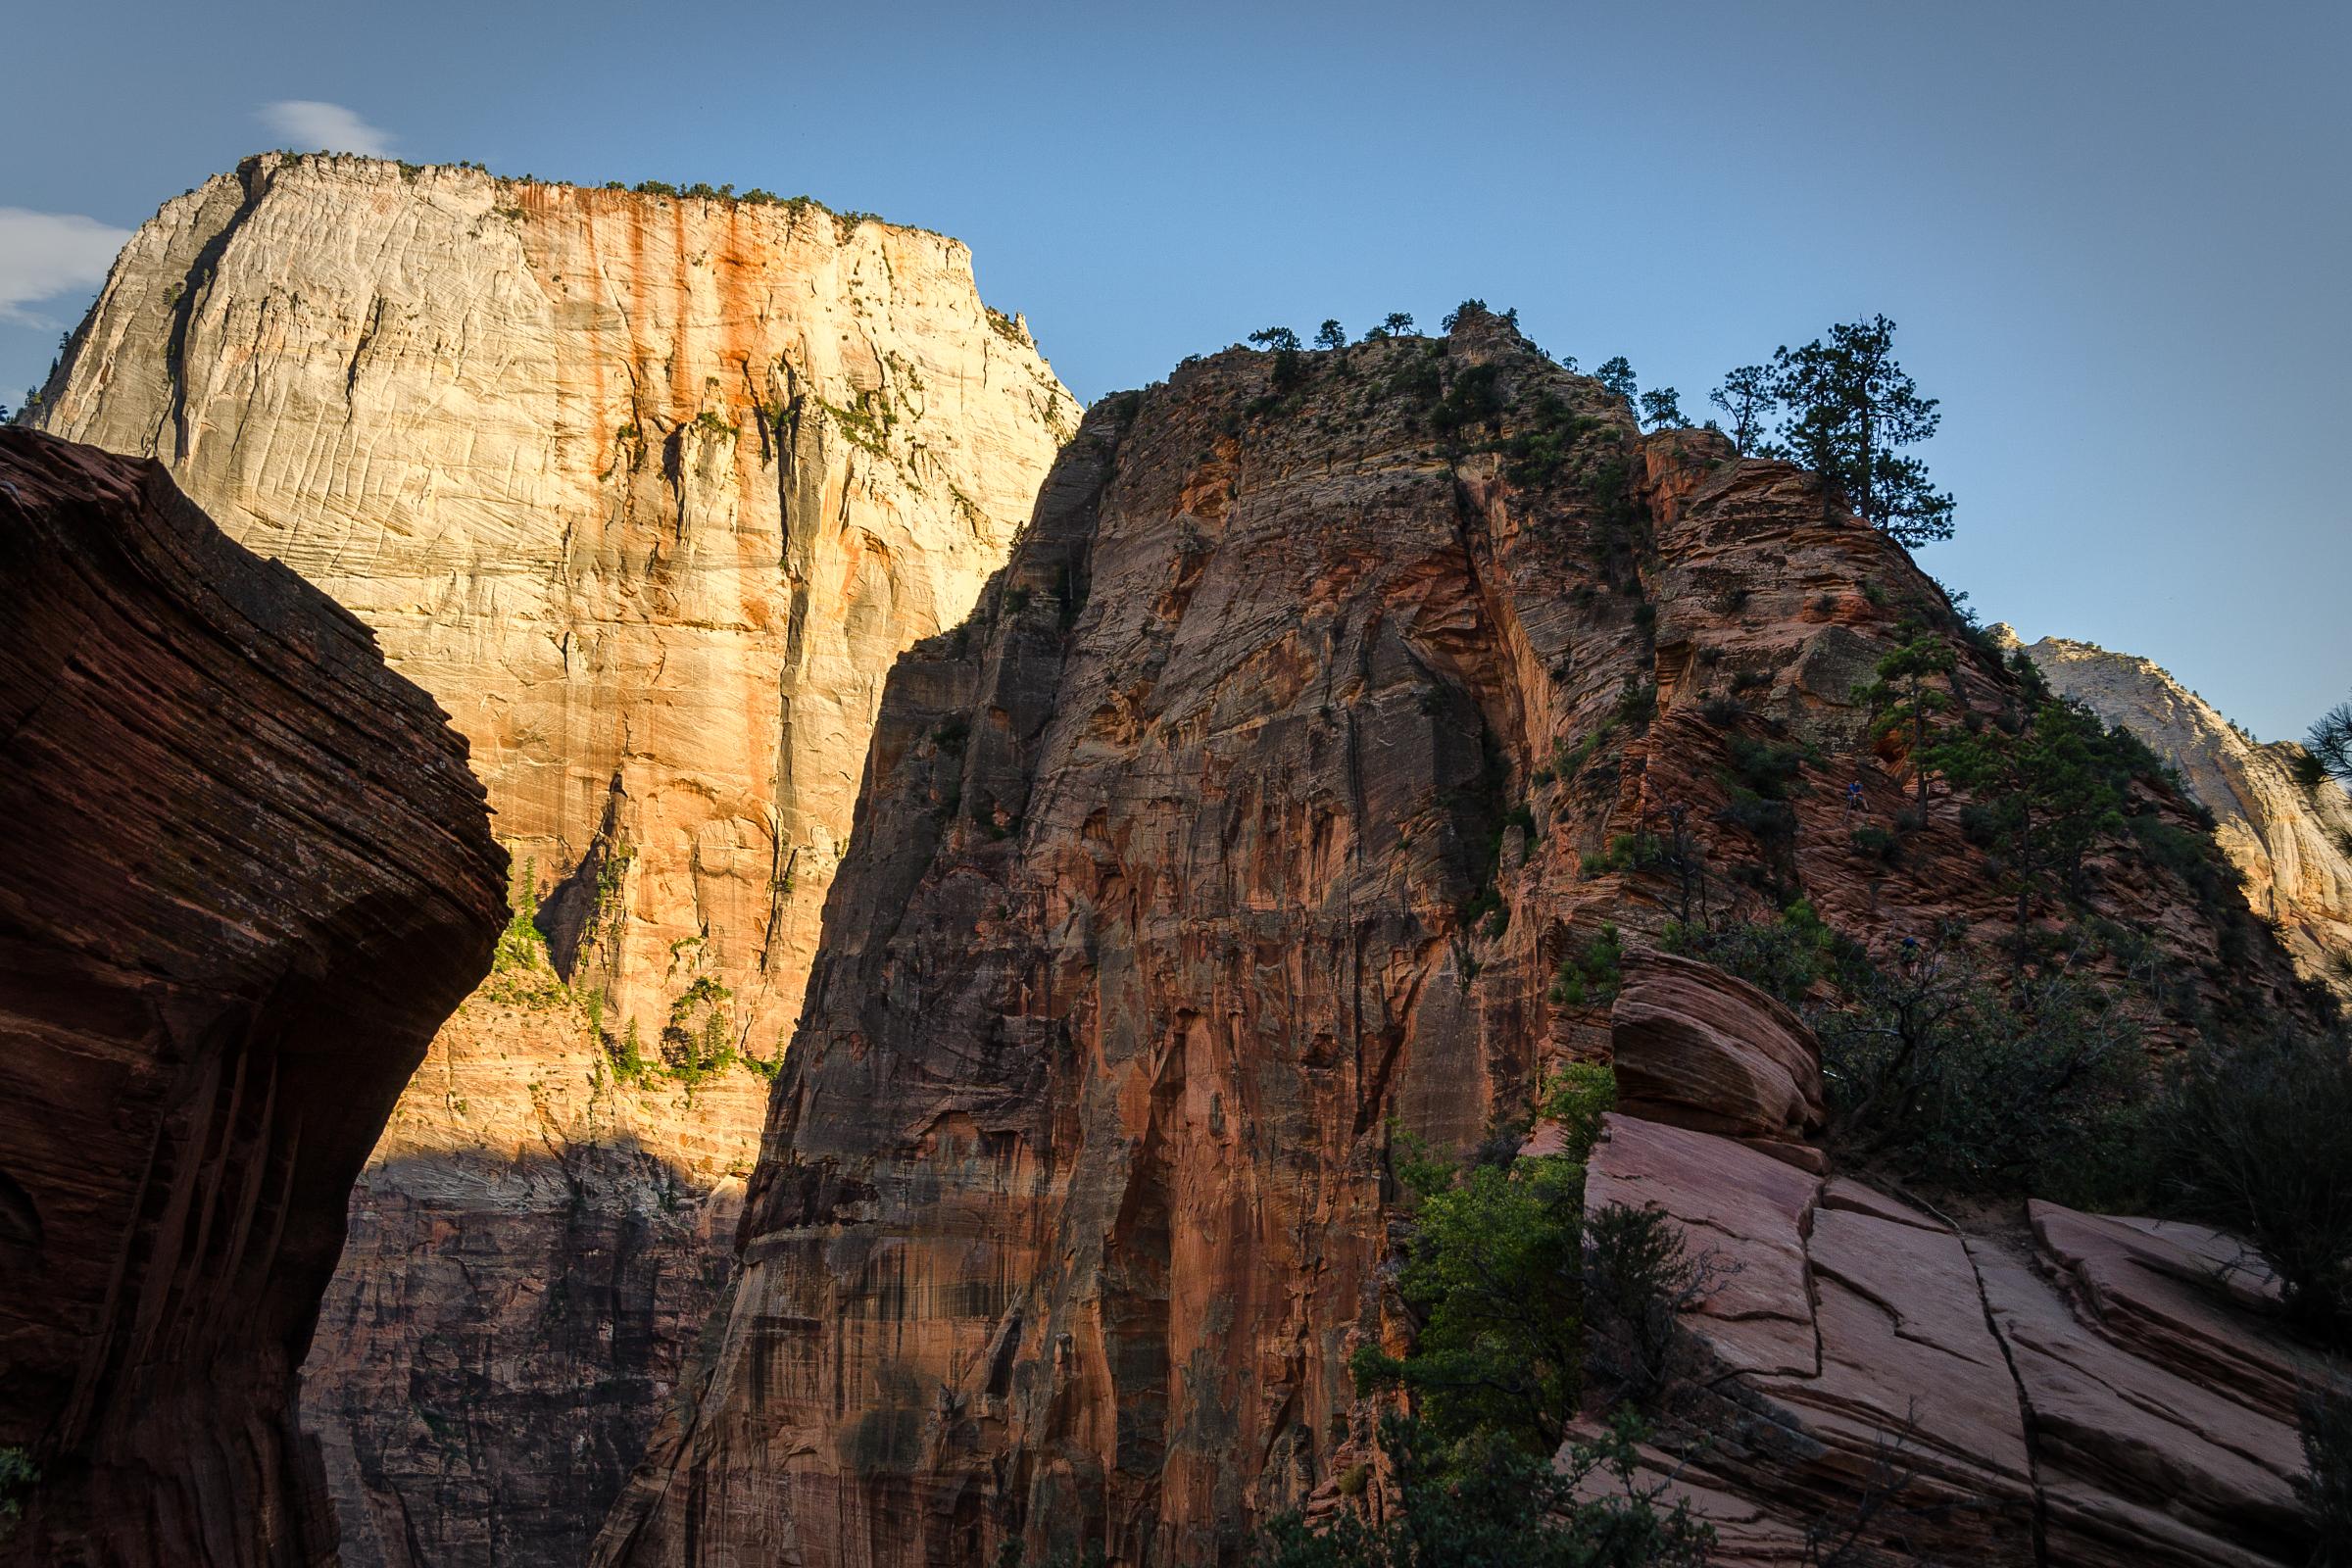 Angel's Landing. Zion National Park, Utah. Wasim Muklashy Photography